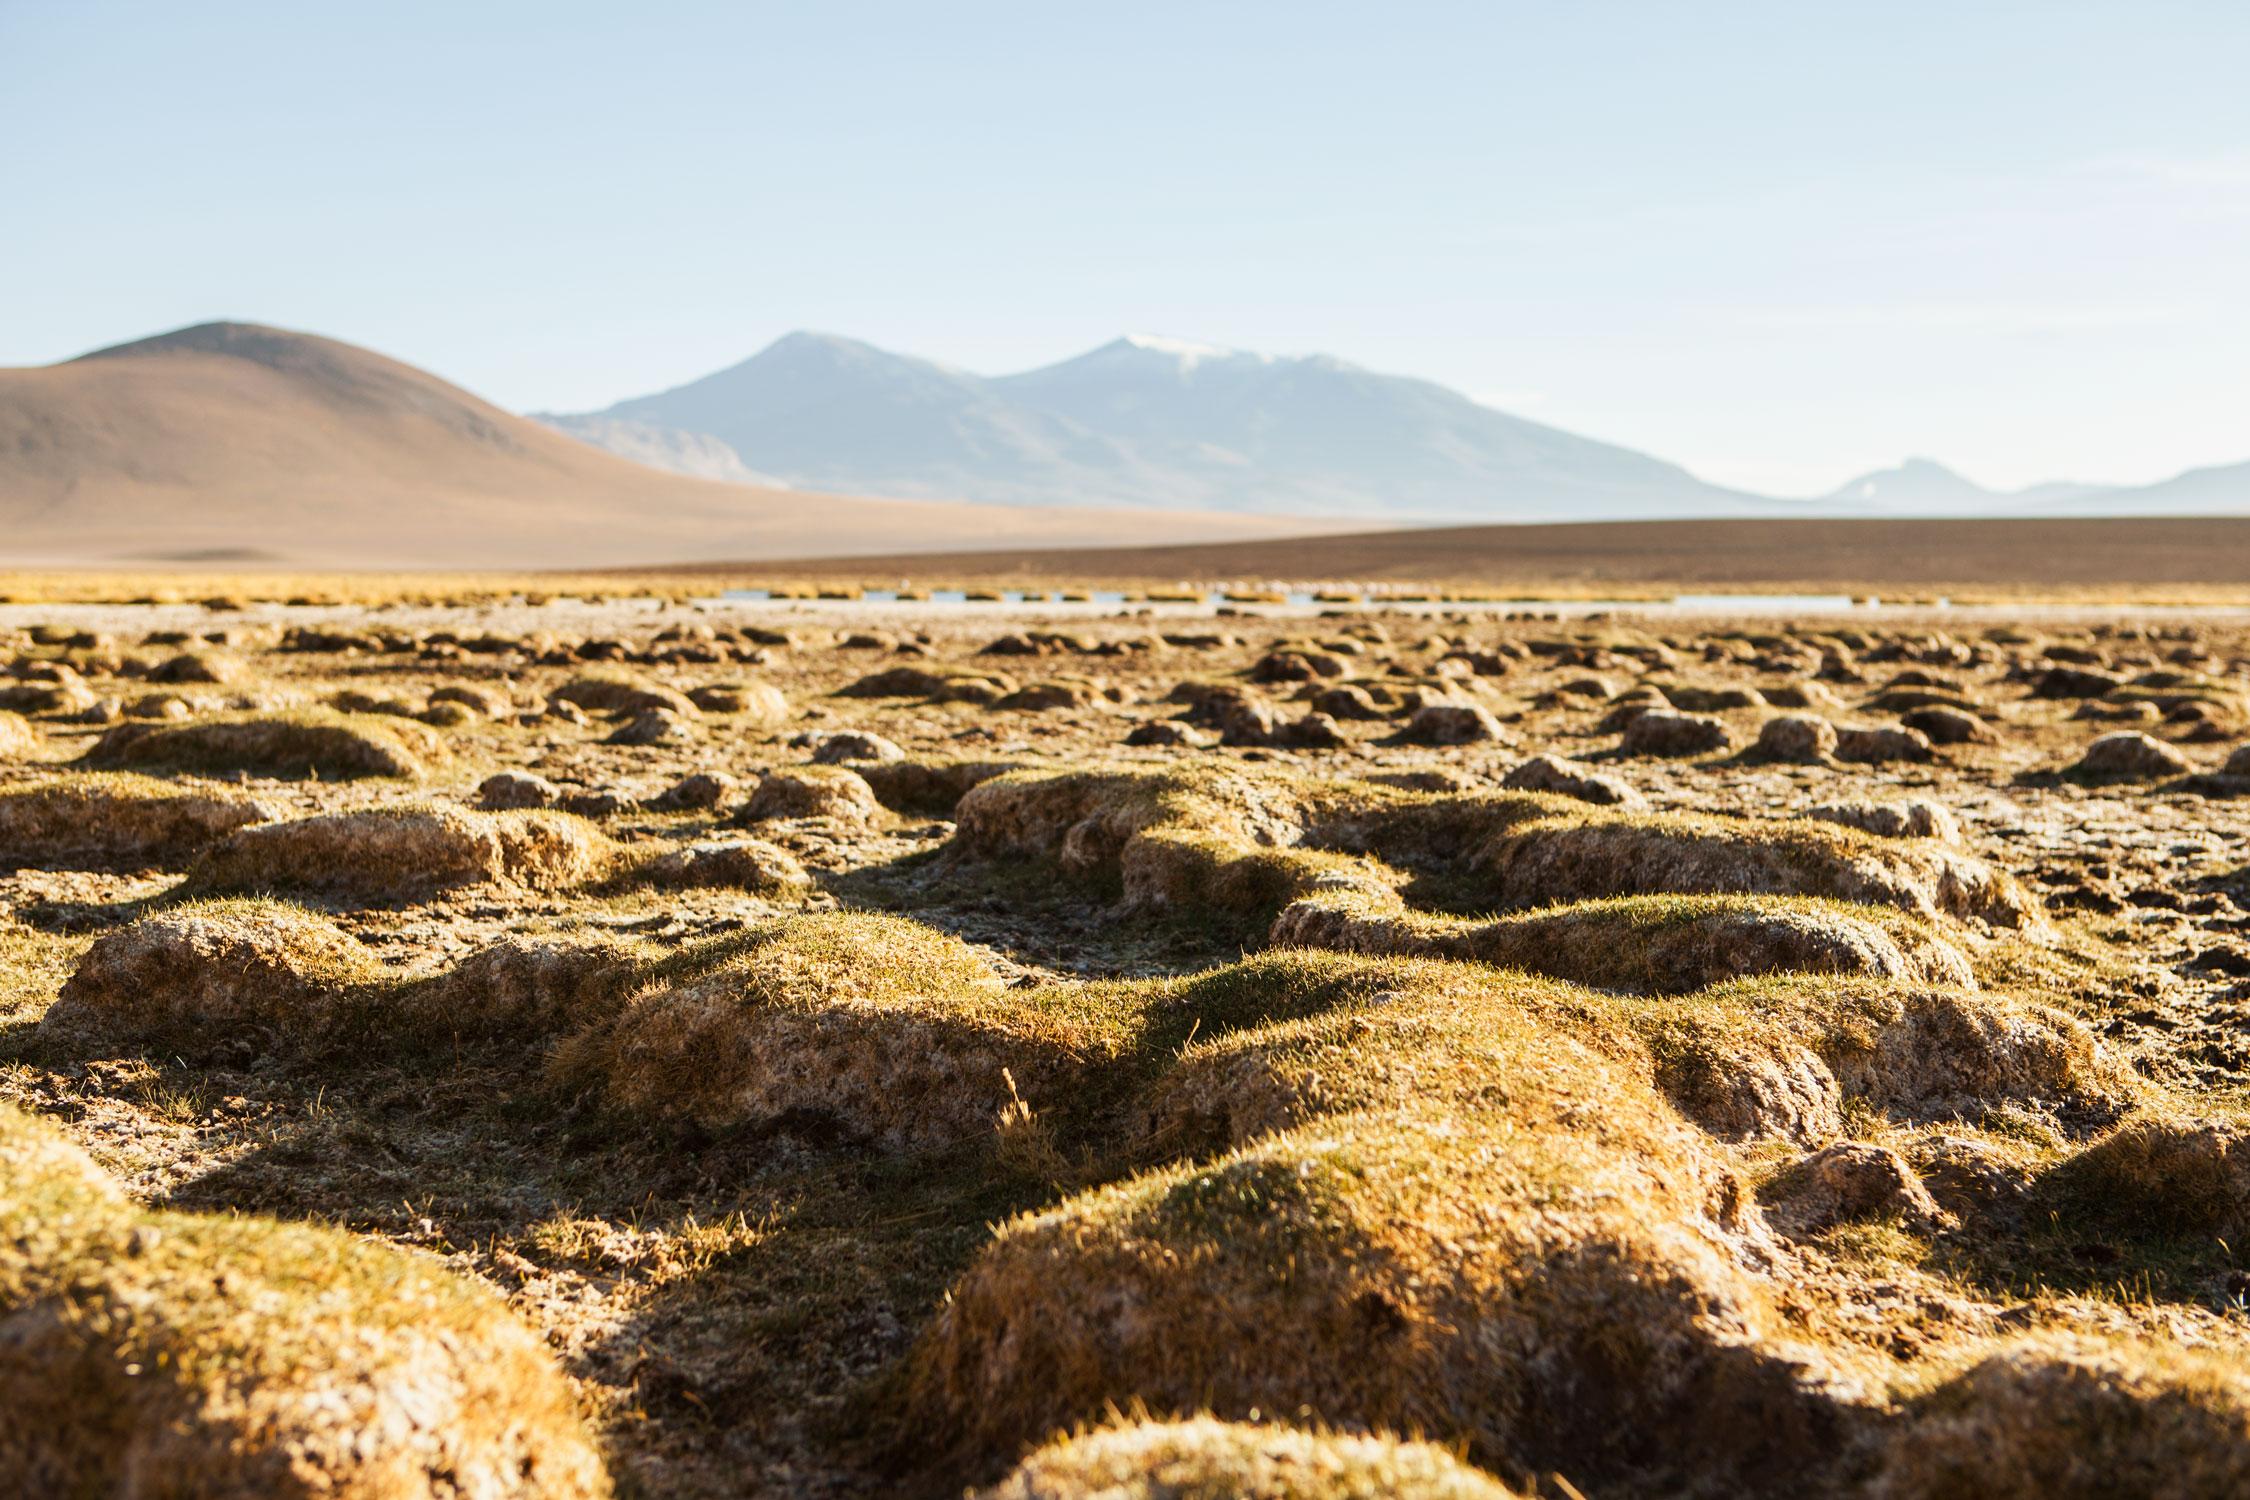 atacama-desert-chile-wander-south-random-3.jpg